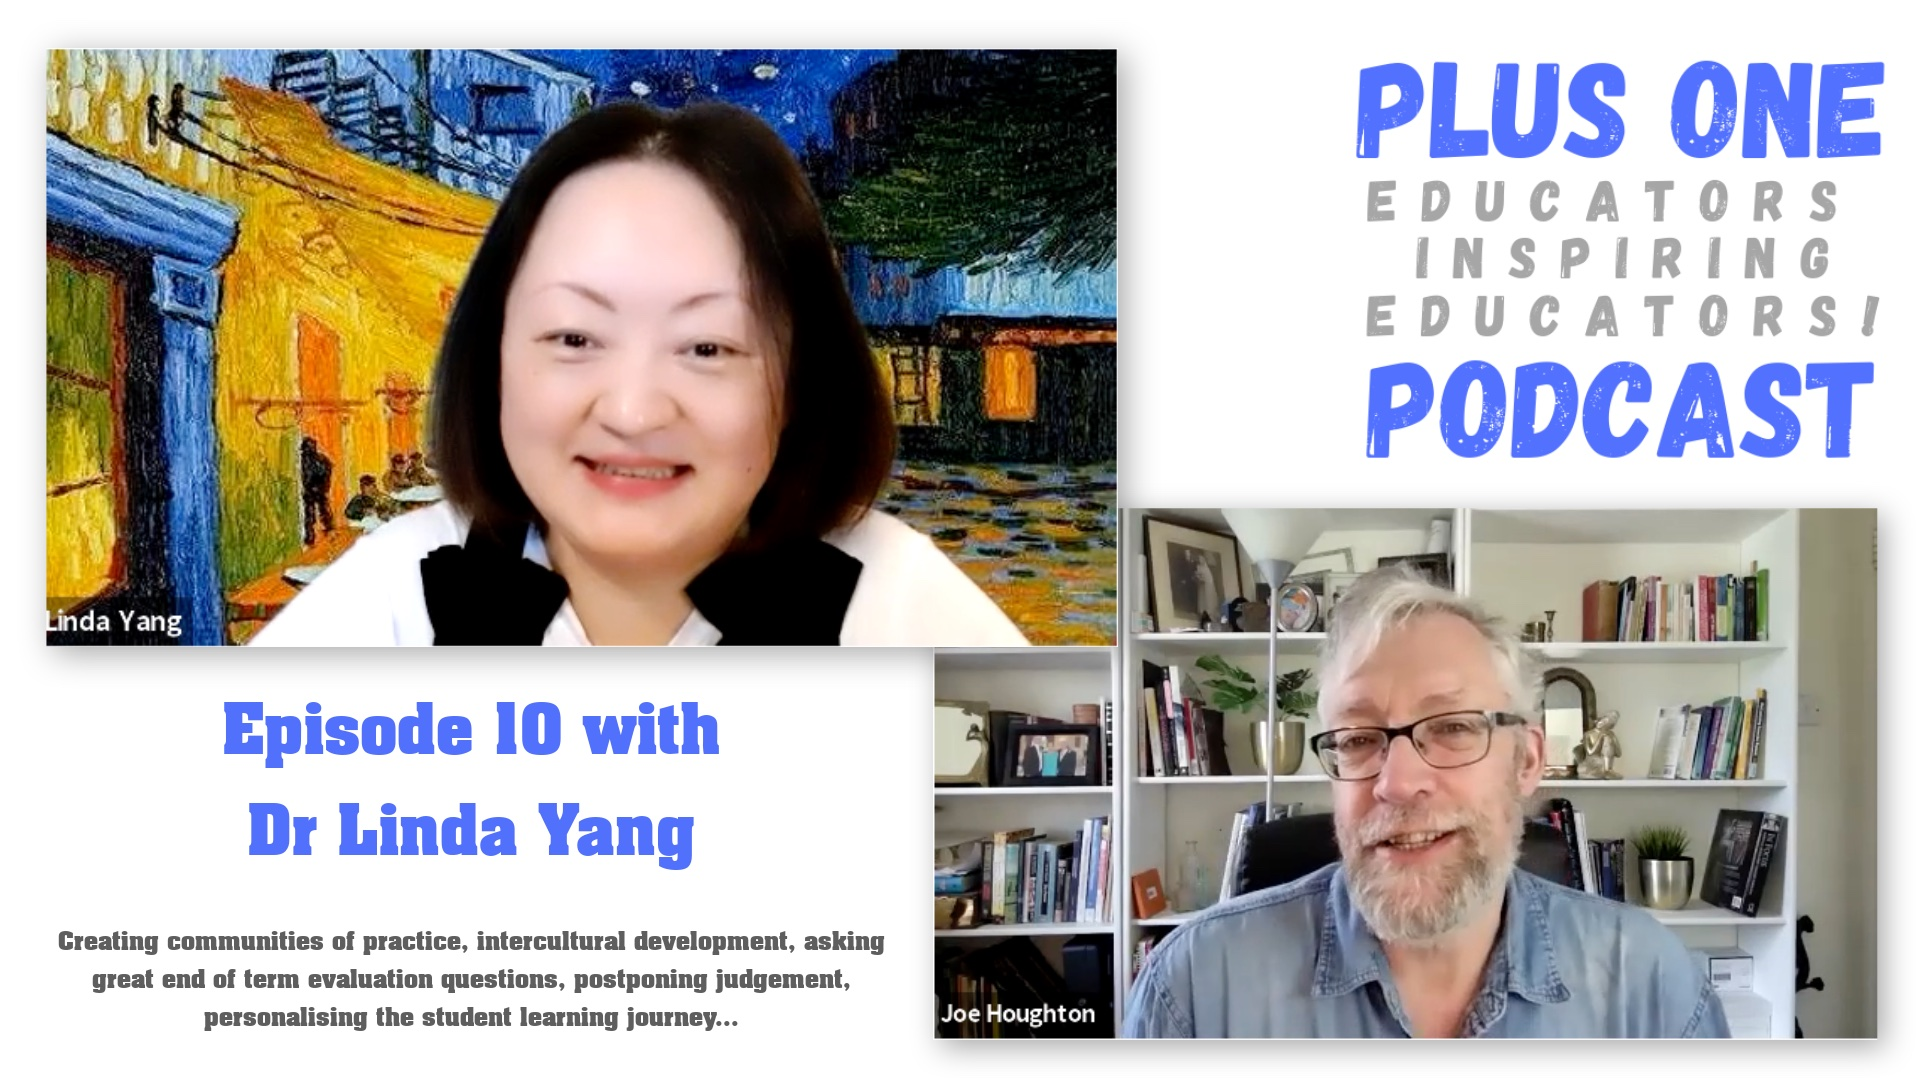 Episode 10 - Plus One Podcast - Linda Yang -